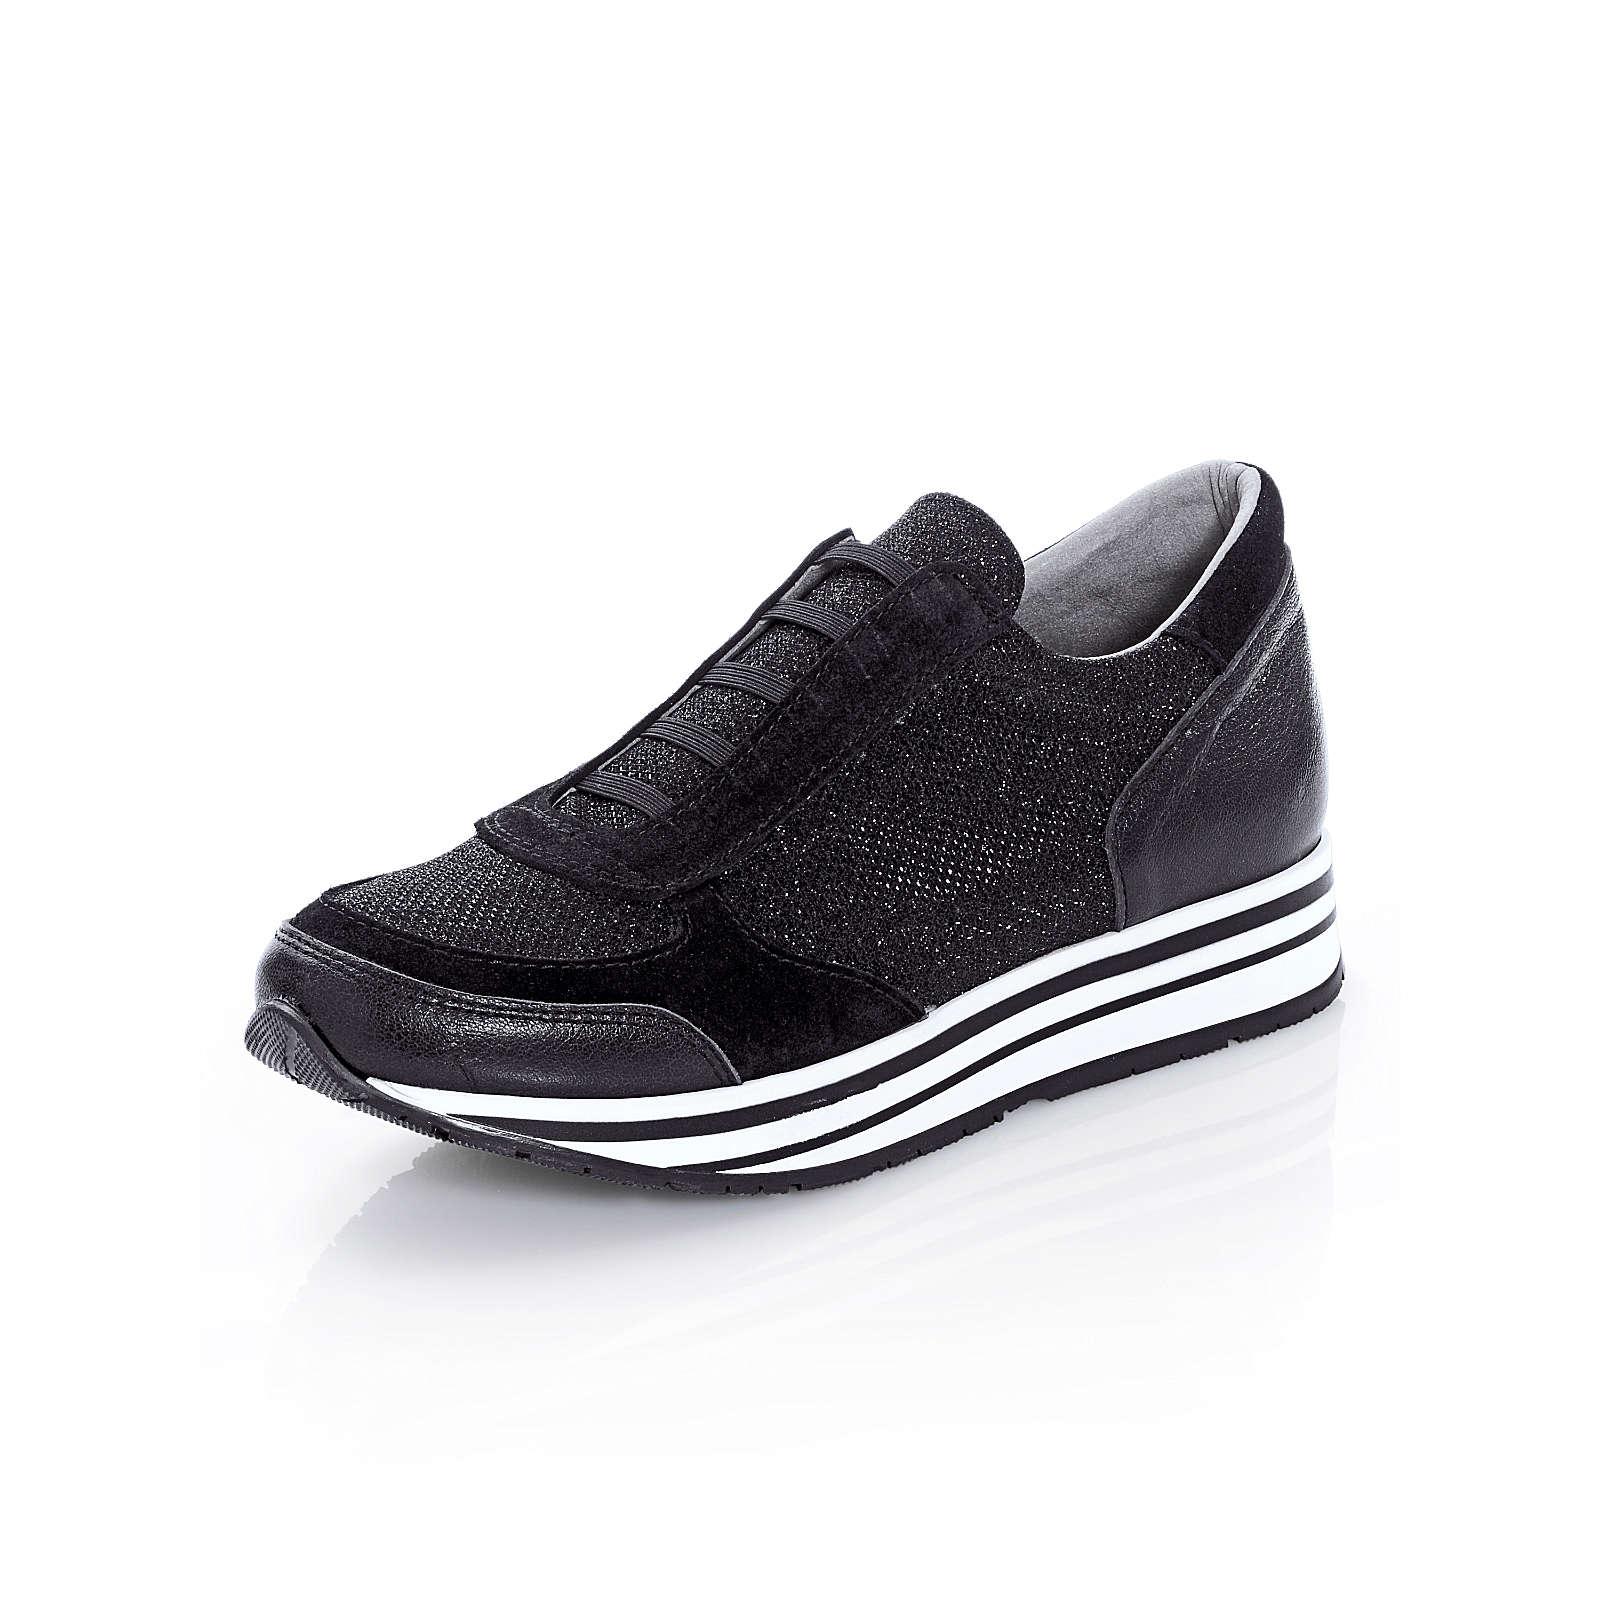 Alba Moda Sneaker schwarz Damen Gr. 38